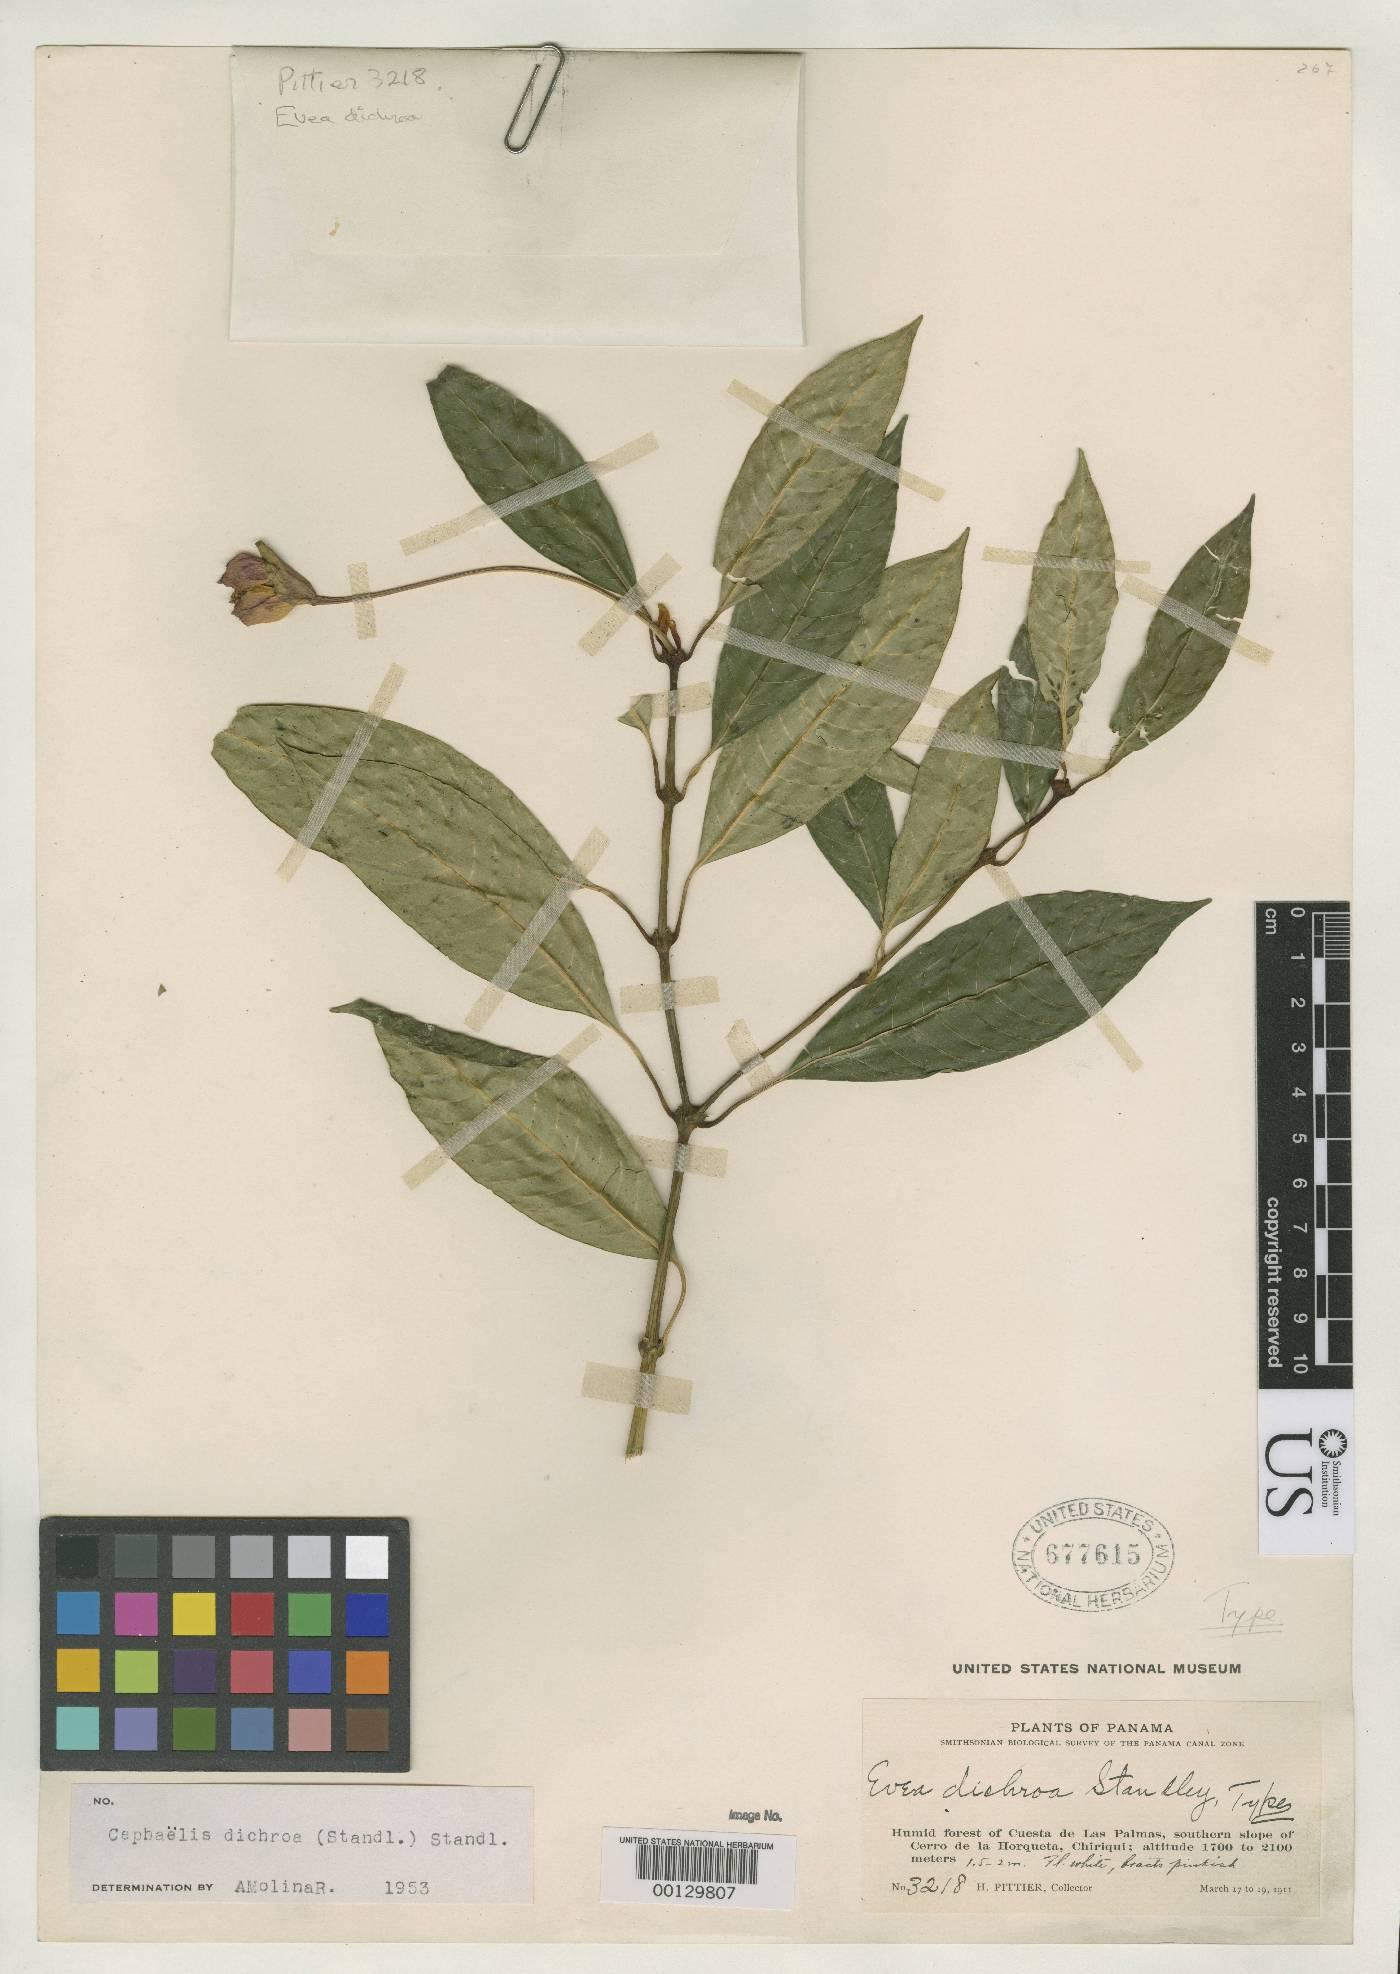 Psychotria dichroa image